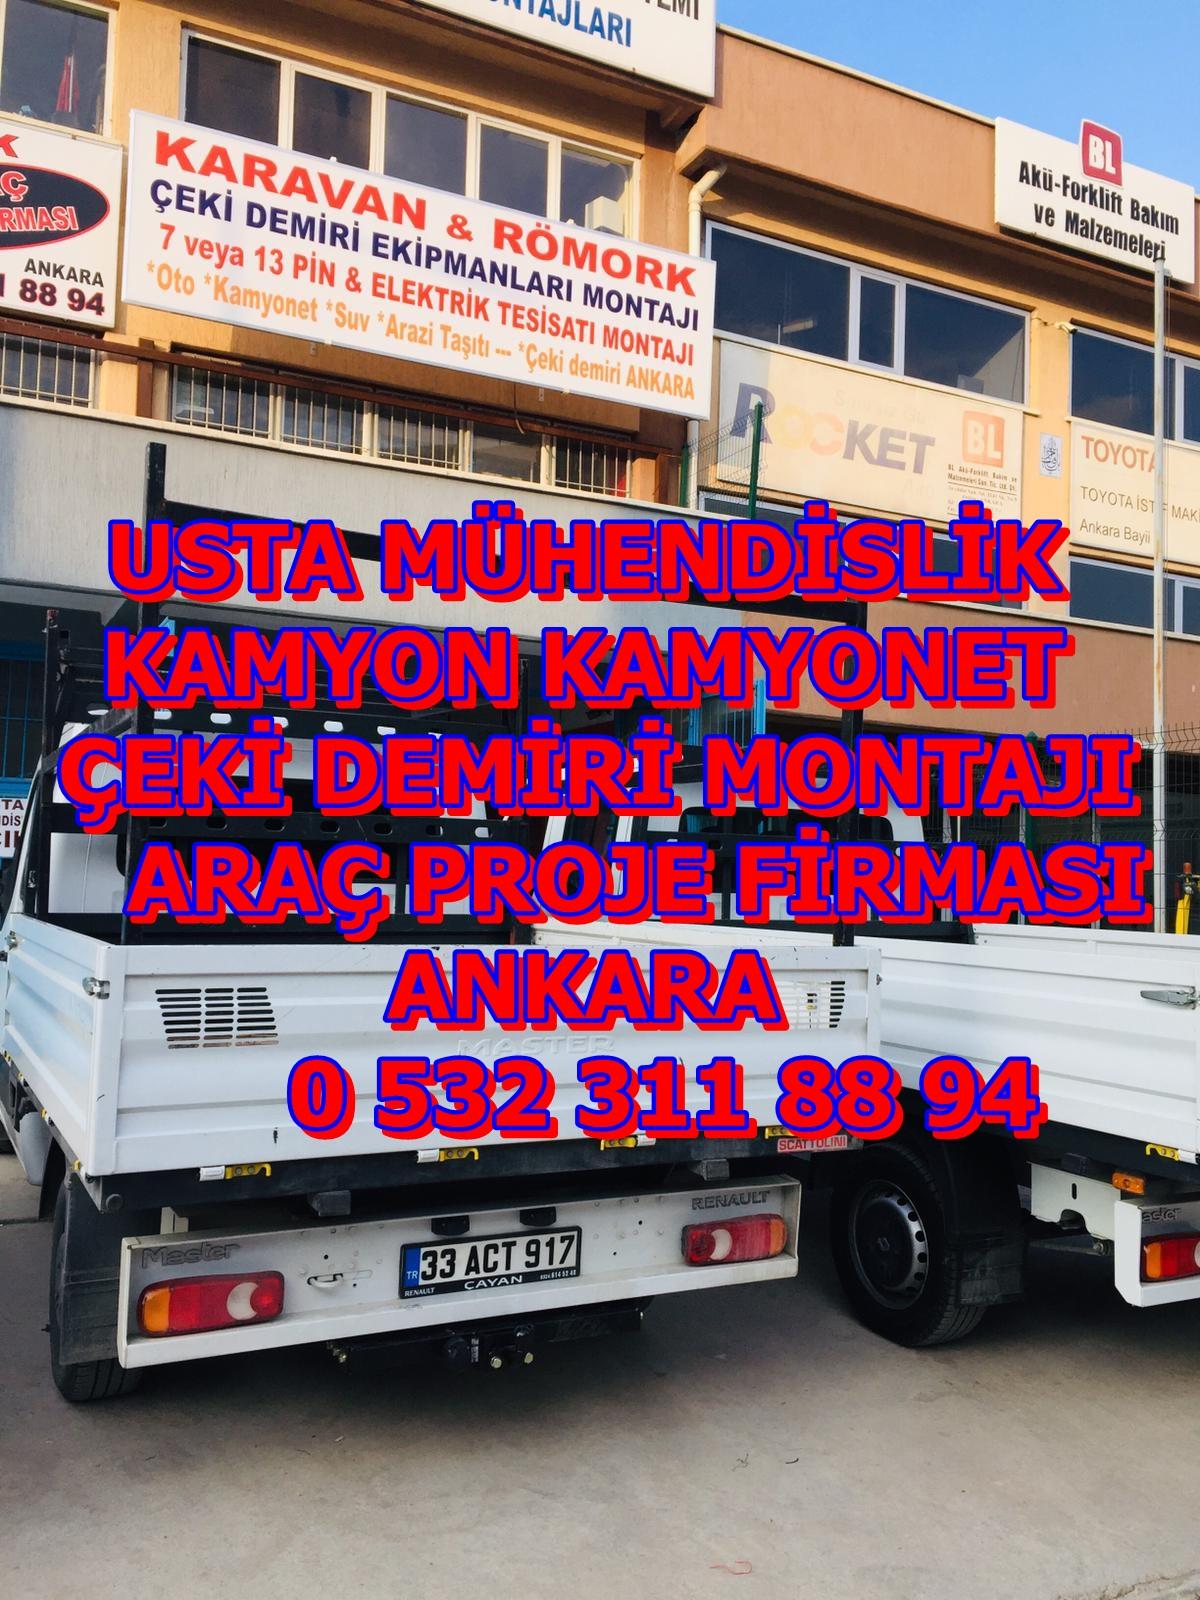 MASTER KAMYONET ÇEKİ DEMİRİ ANKARA USTA MÜHENDİSLİK 05323118894